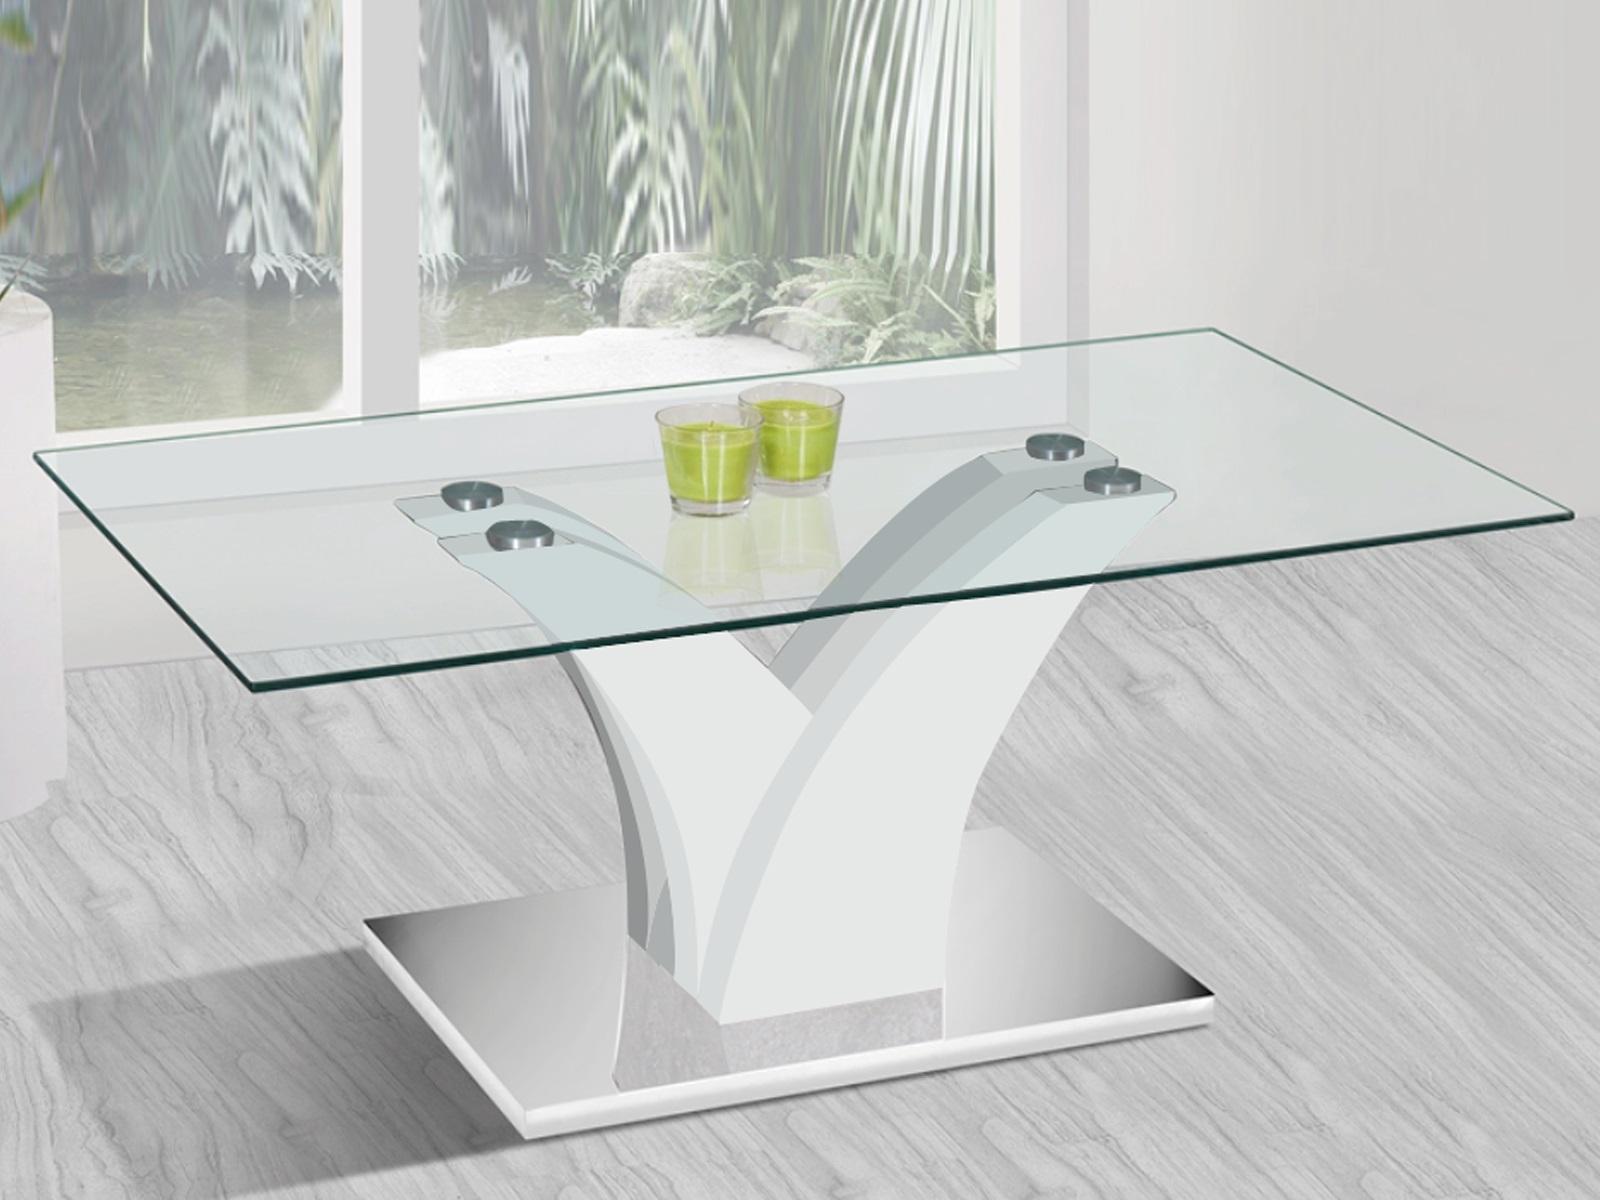 Moderne Glazen Salontafels.Glazen Salontafel Met Zuilen Aktiewonen Nl